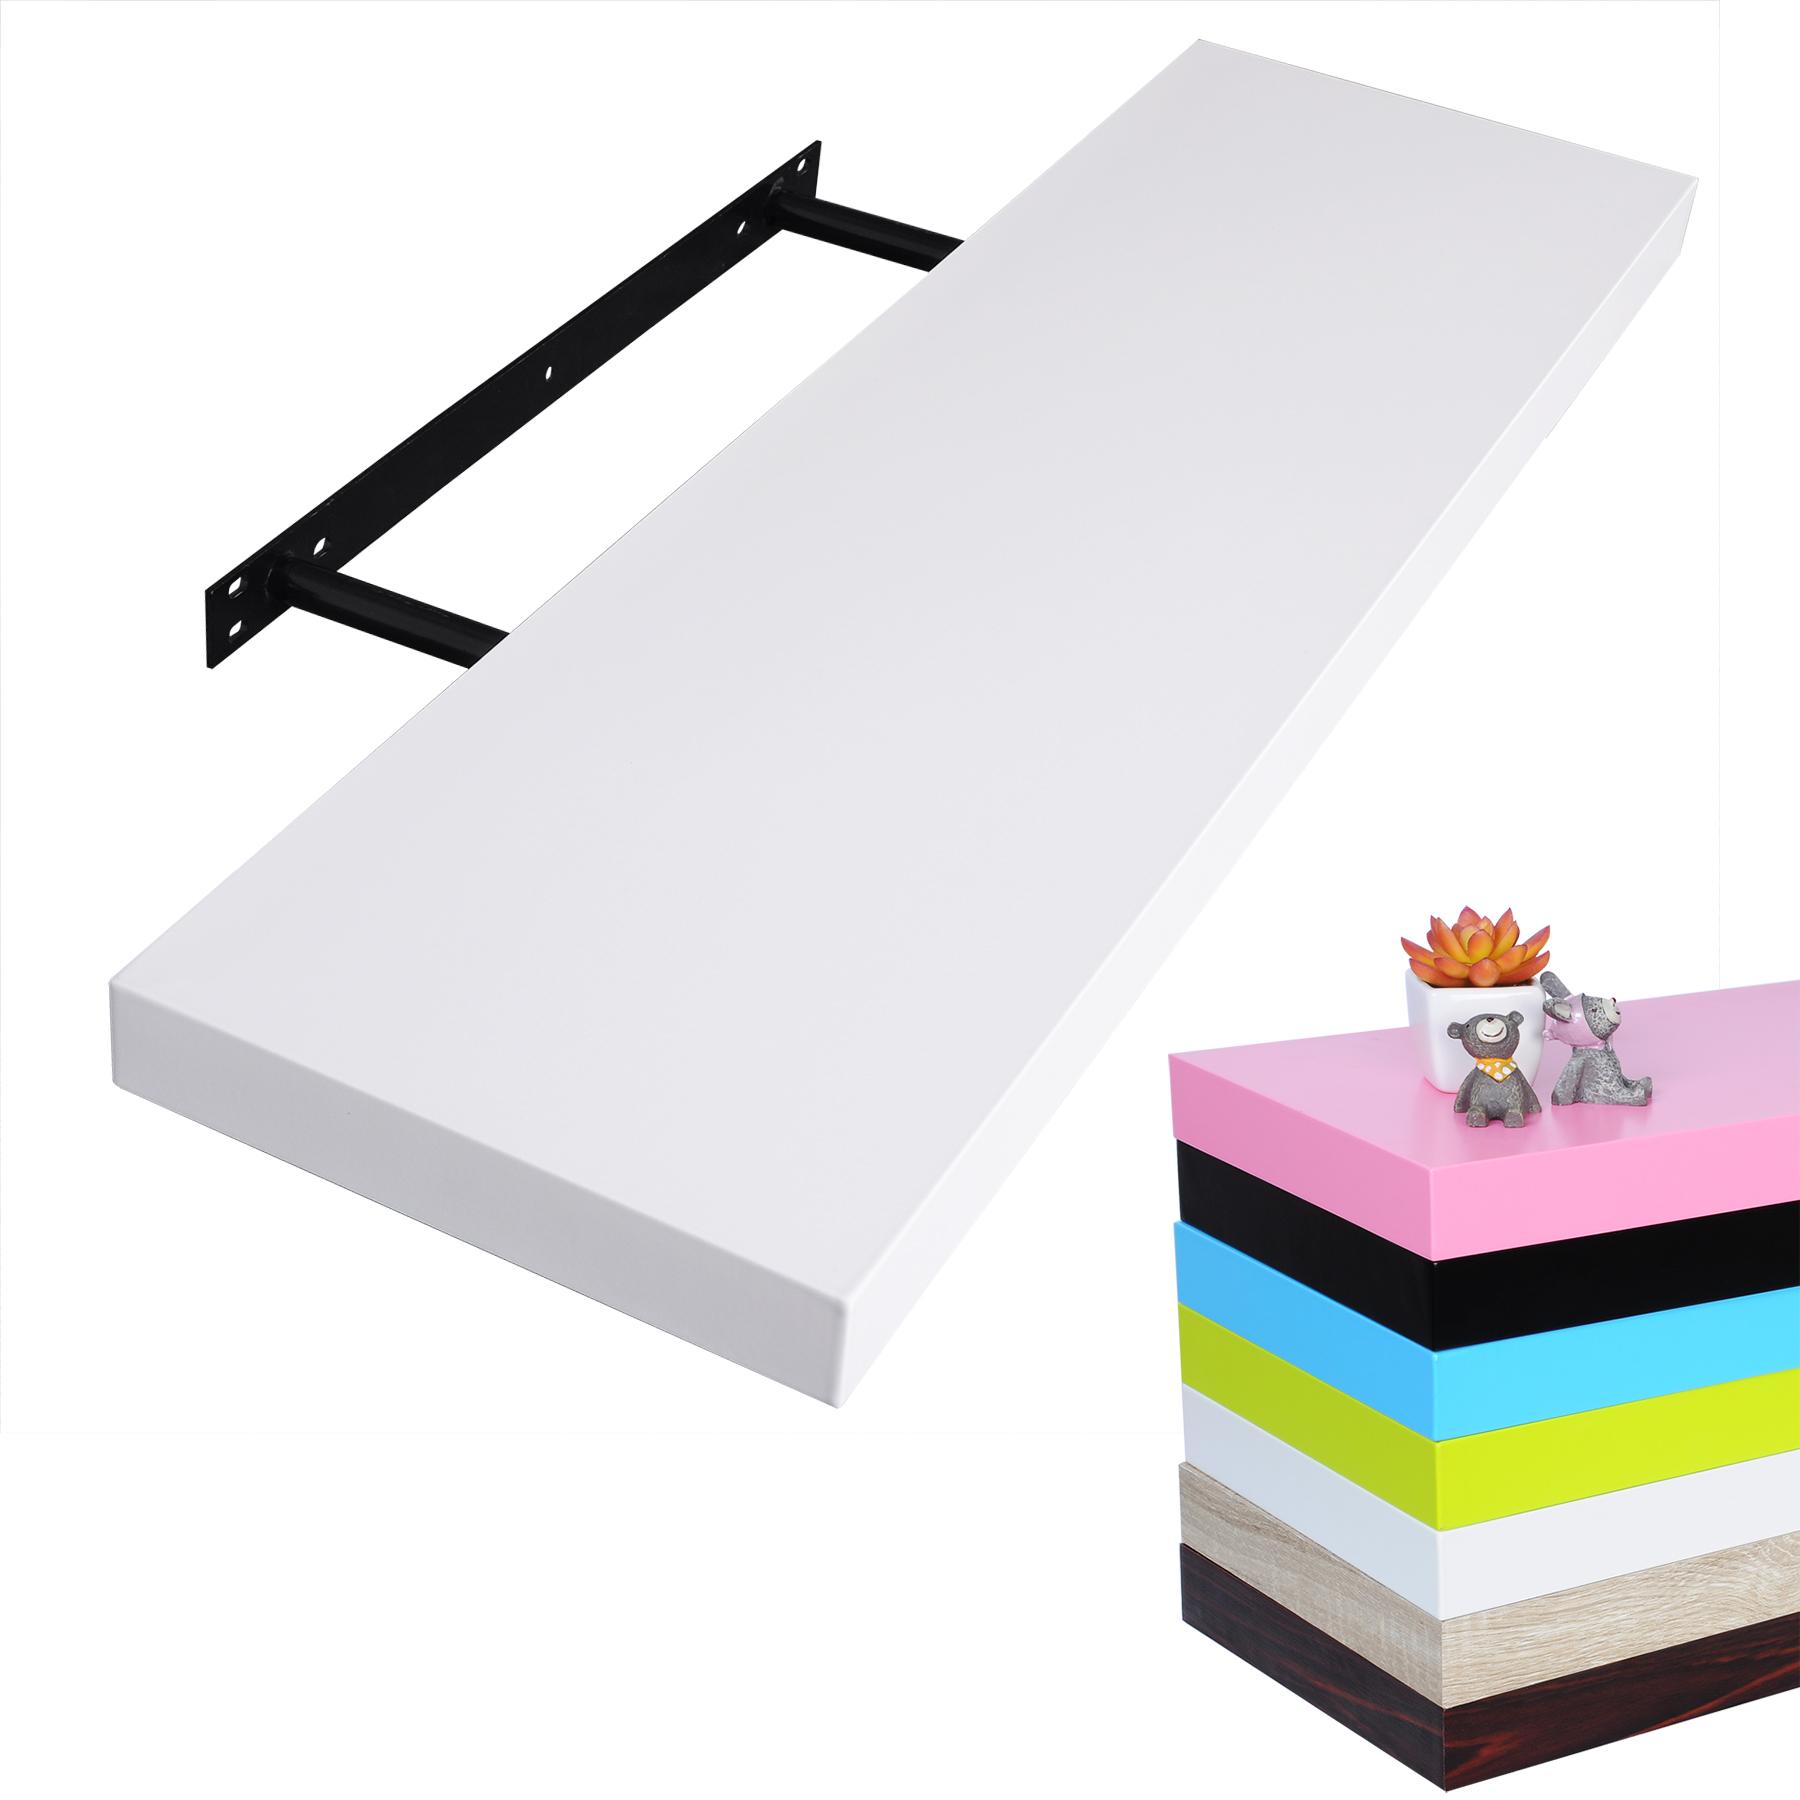 wandboard wandregal b cherregal h ngeregal dvd cd holzregal freischwebend 349 ebay. Black Bedroom Furniture Sets. Home Design Ideas